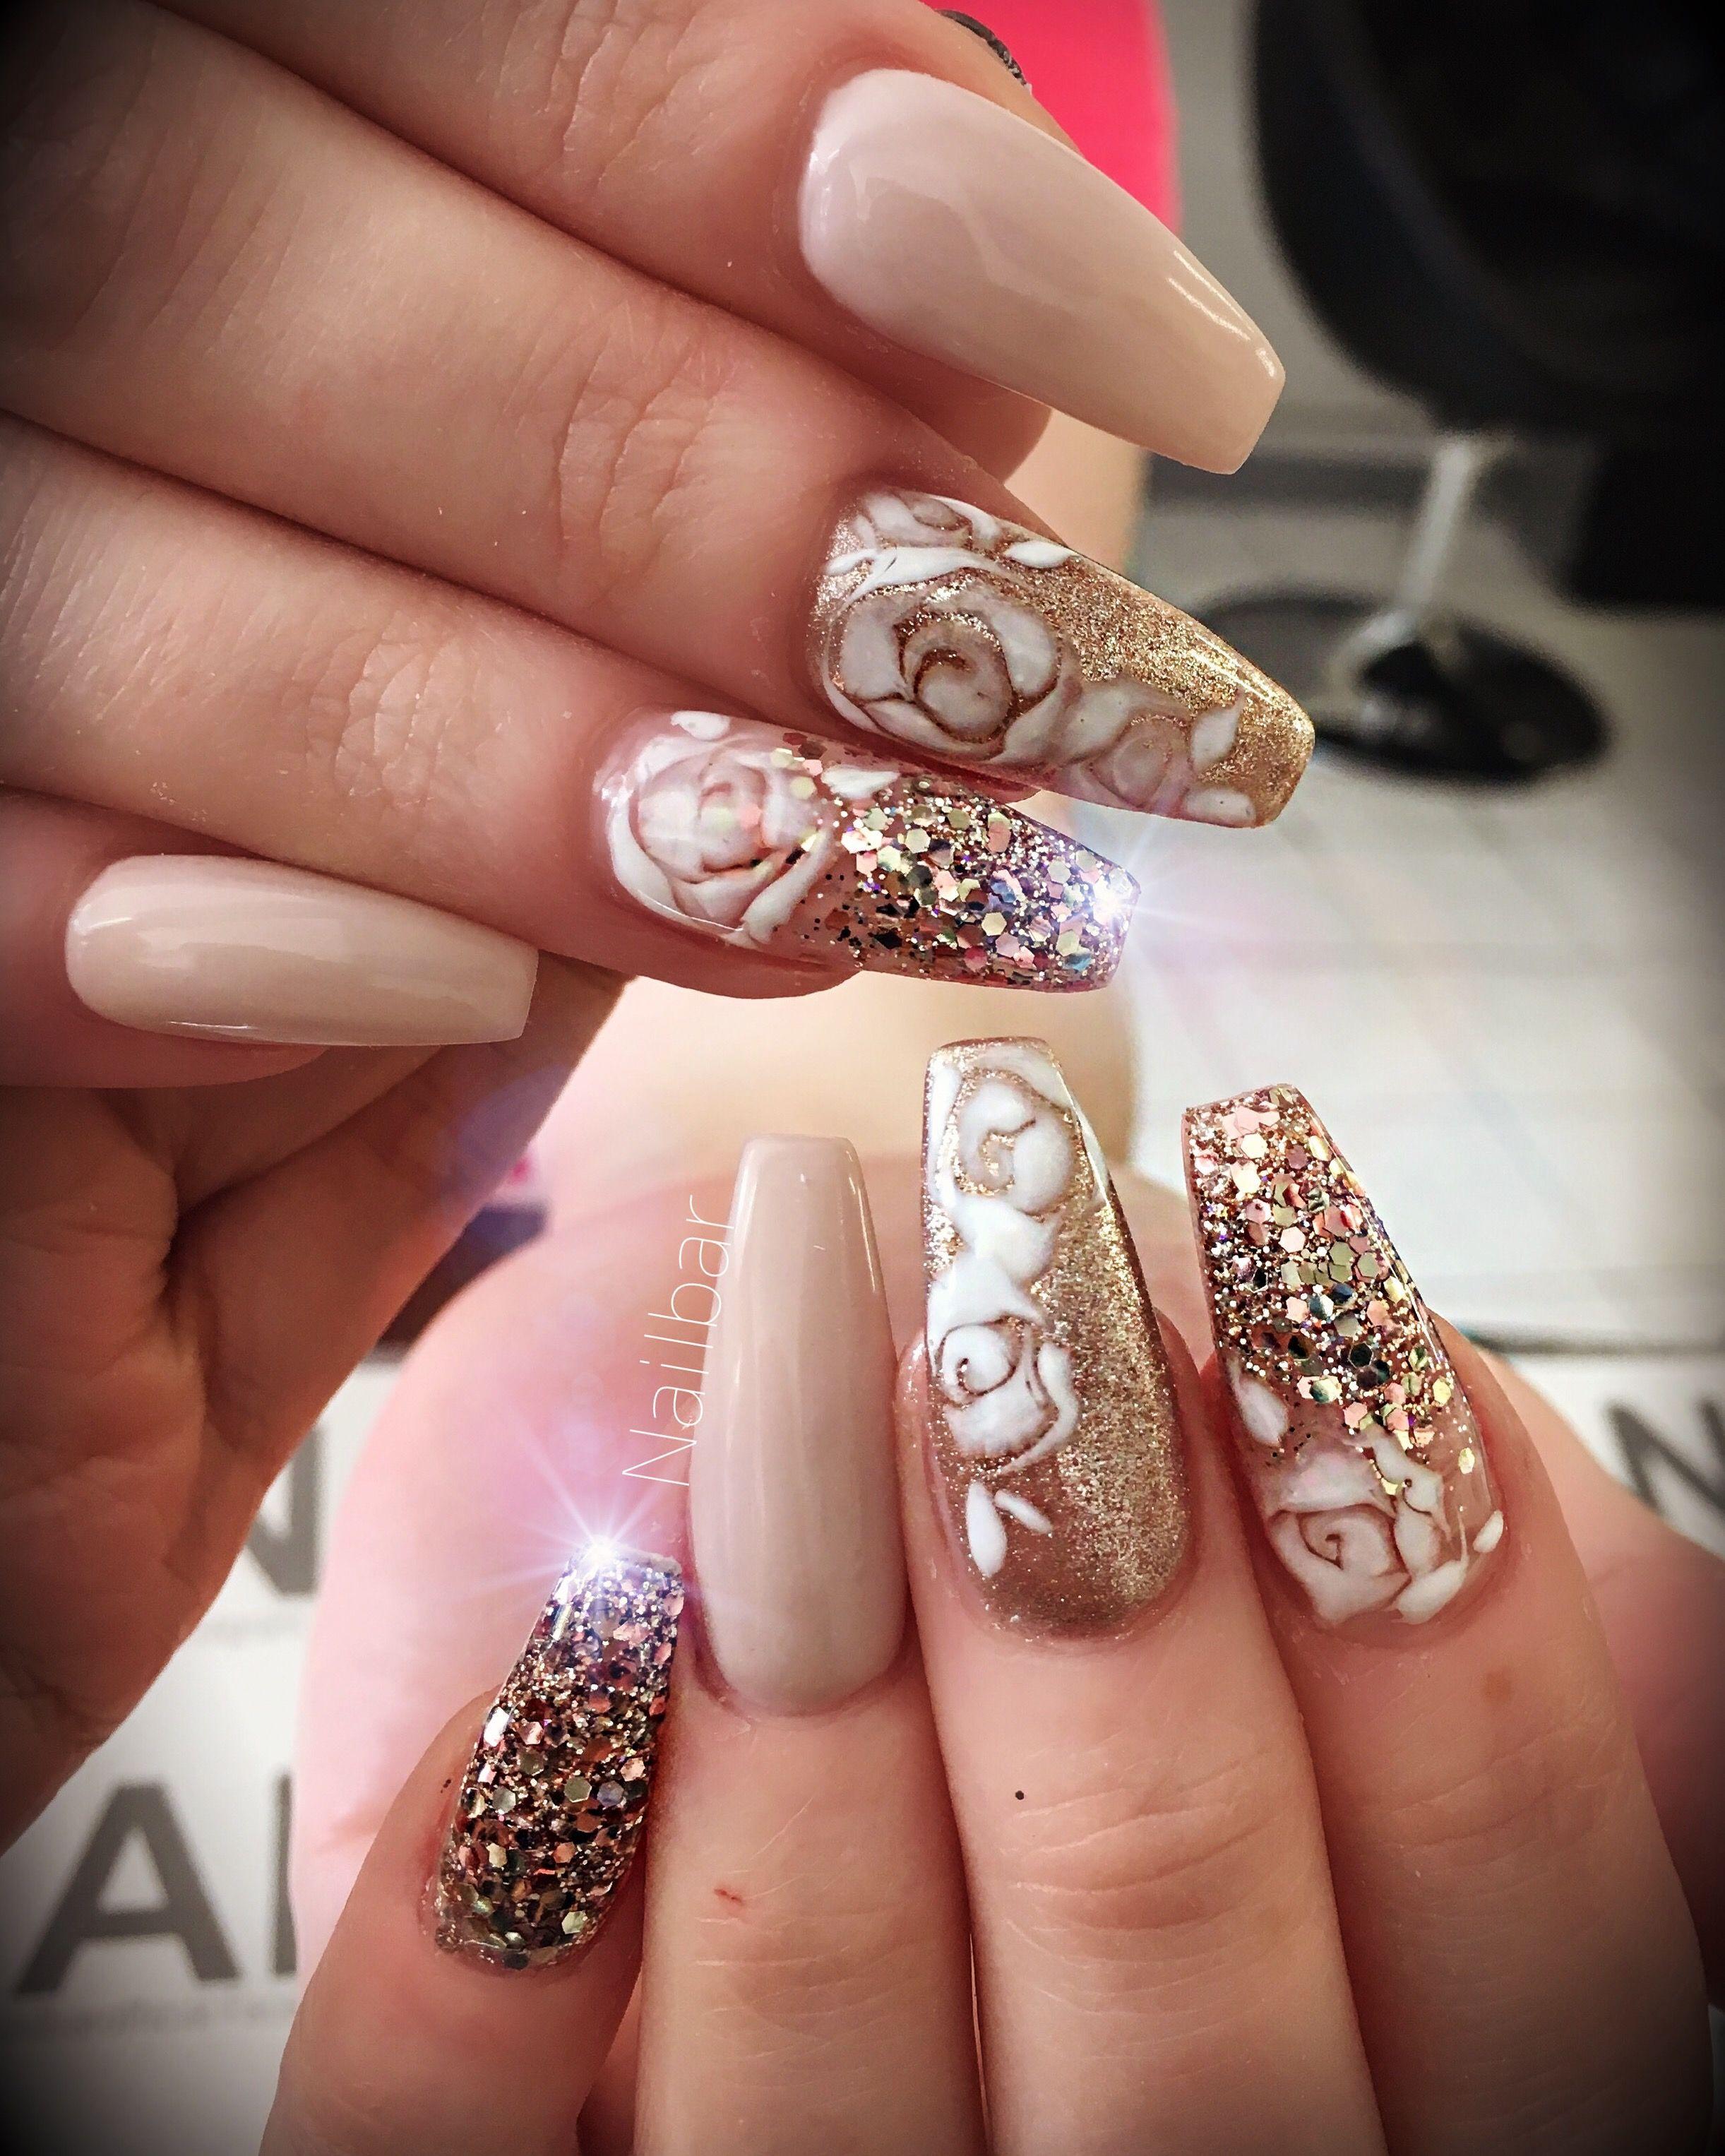 Pin by Valerie Okeefe on fancy nails rhinestones | Pinterest